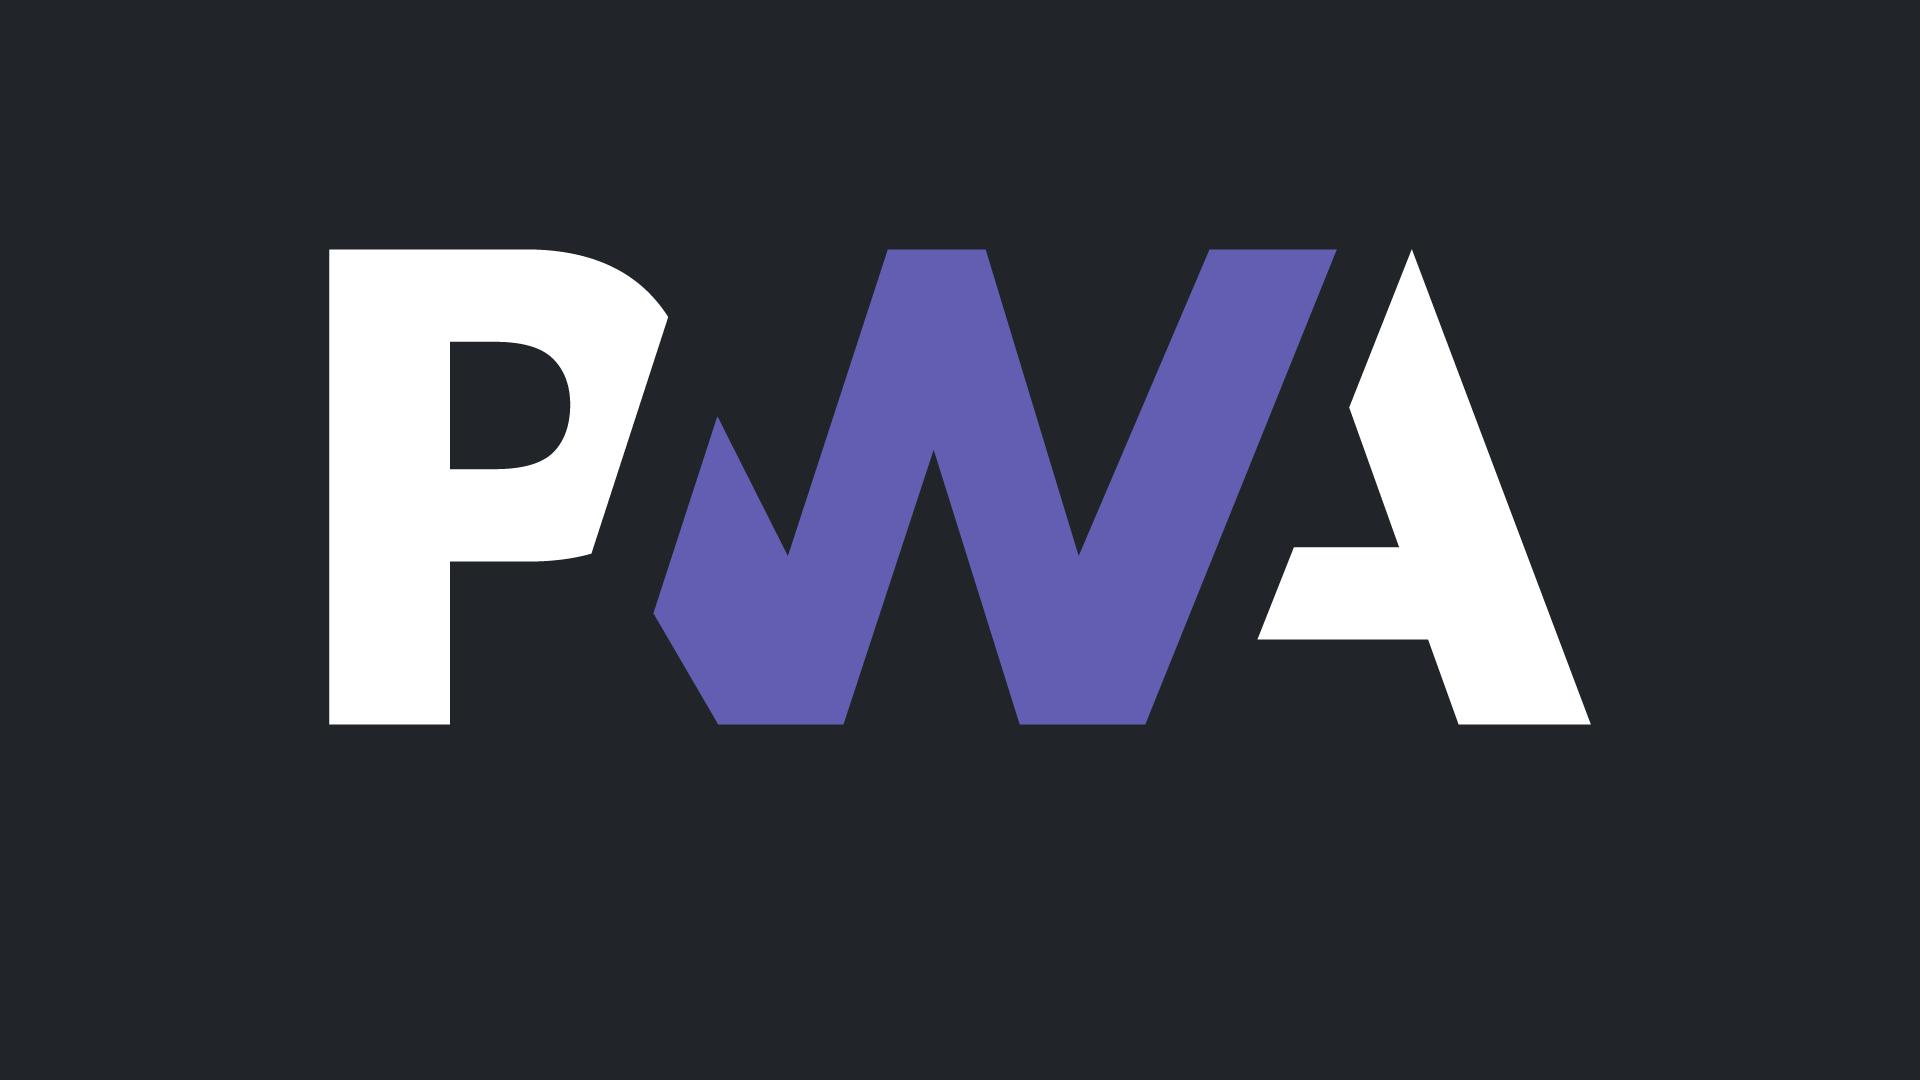 The current state of progressive web apps (PWA)